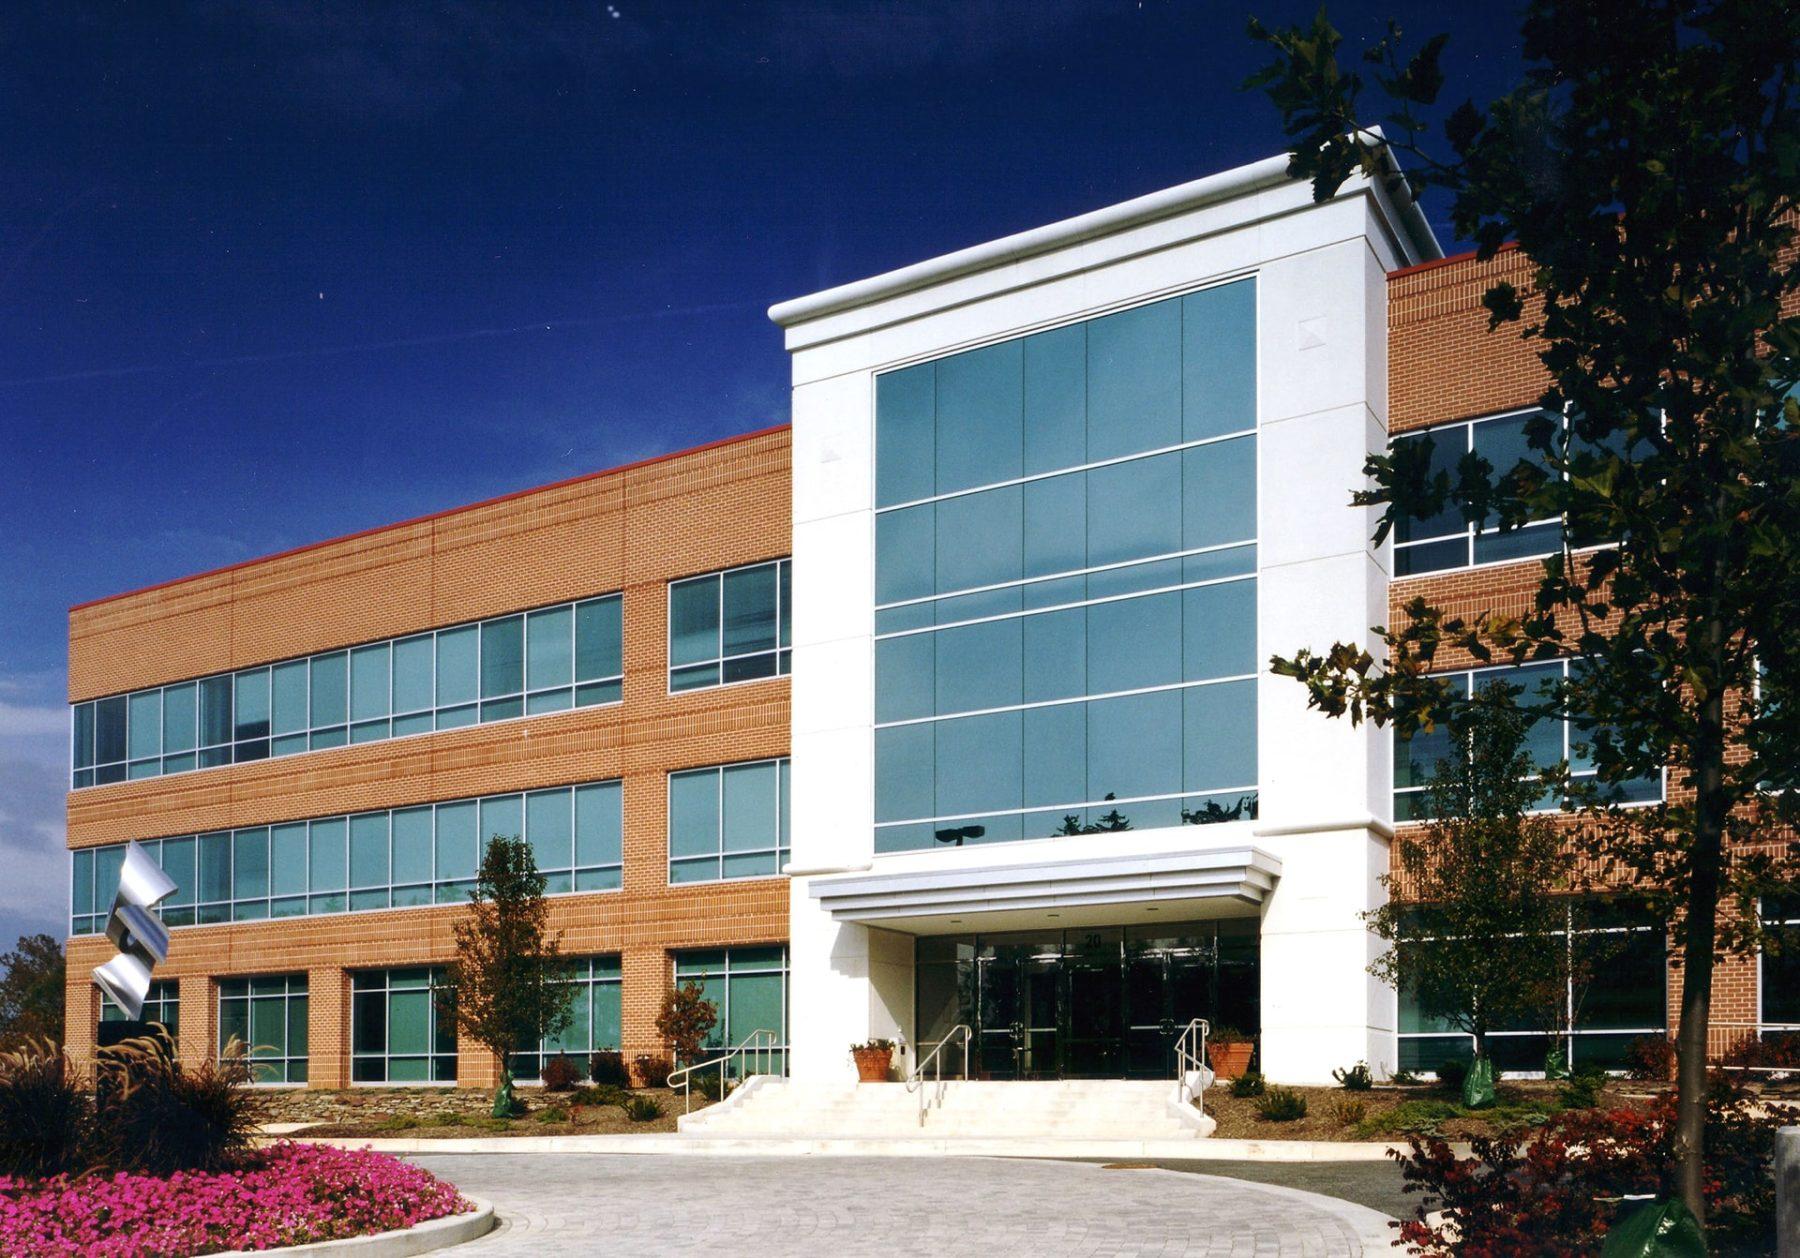 The Millennium Building